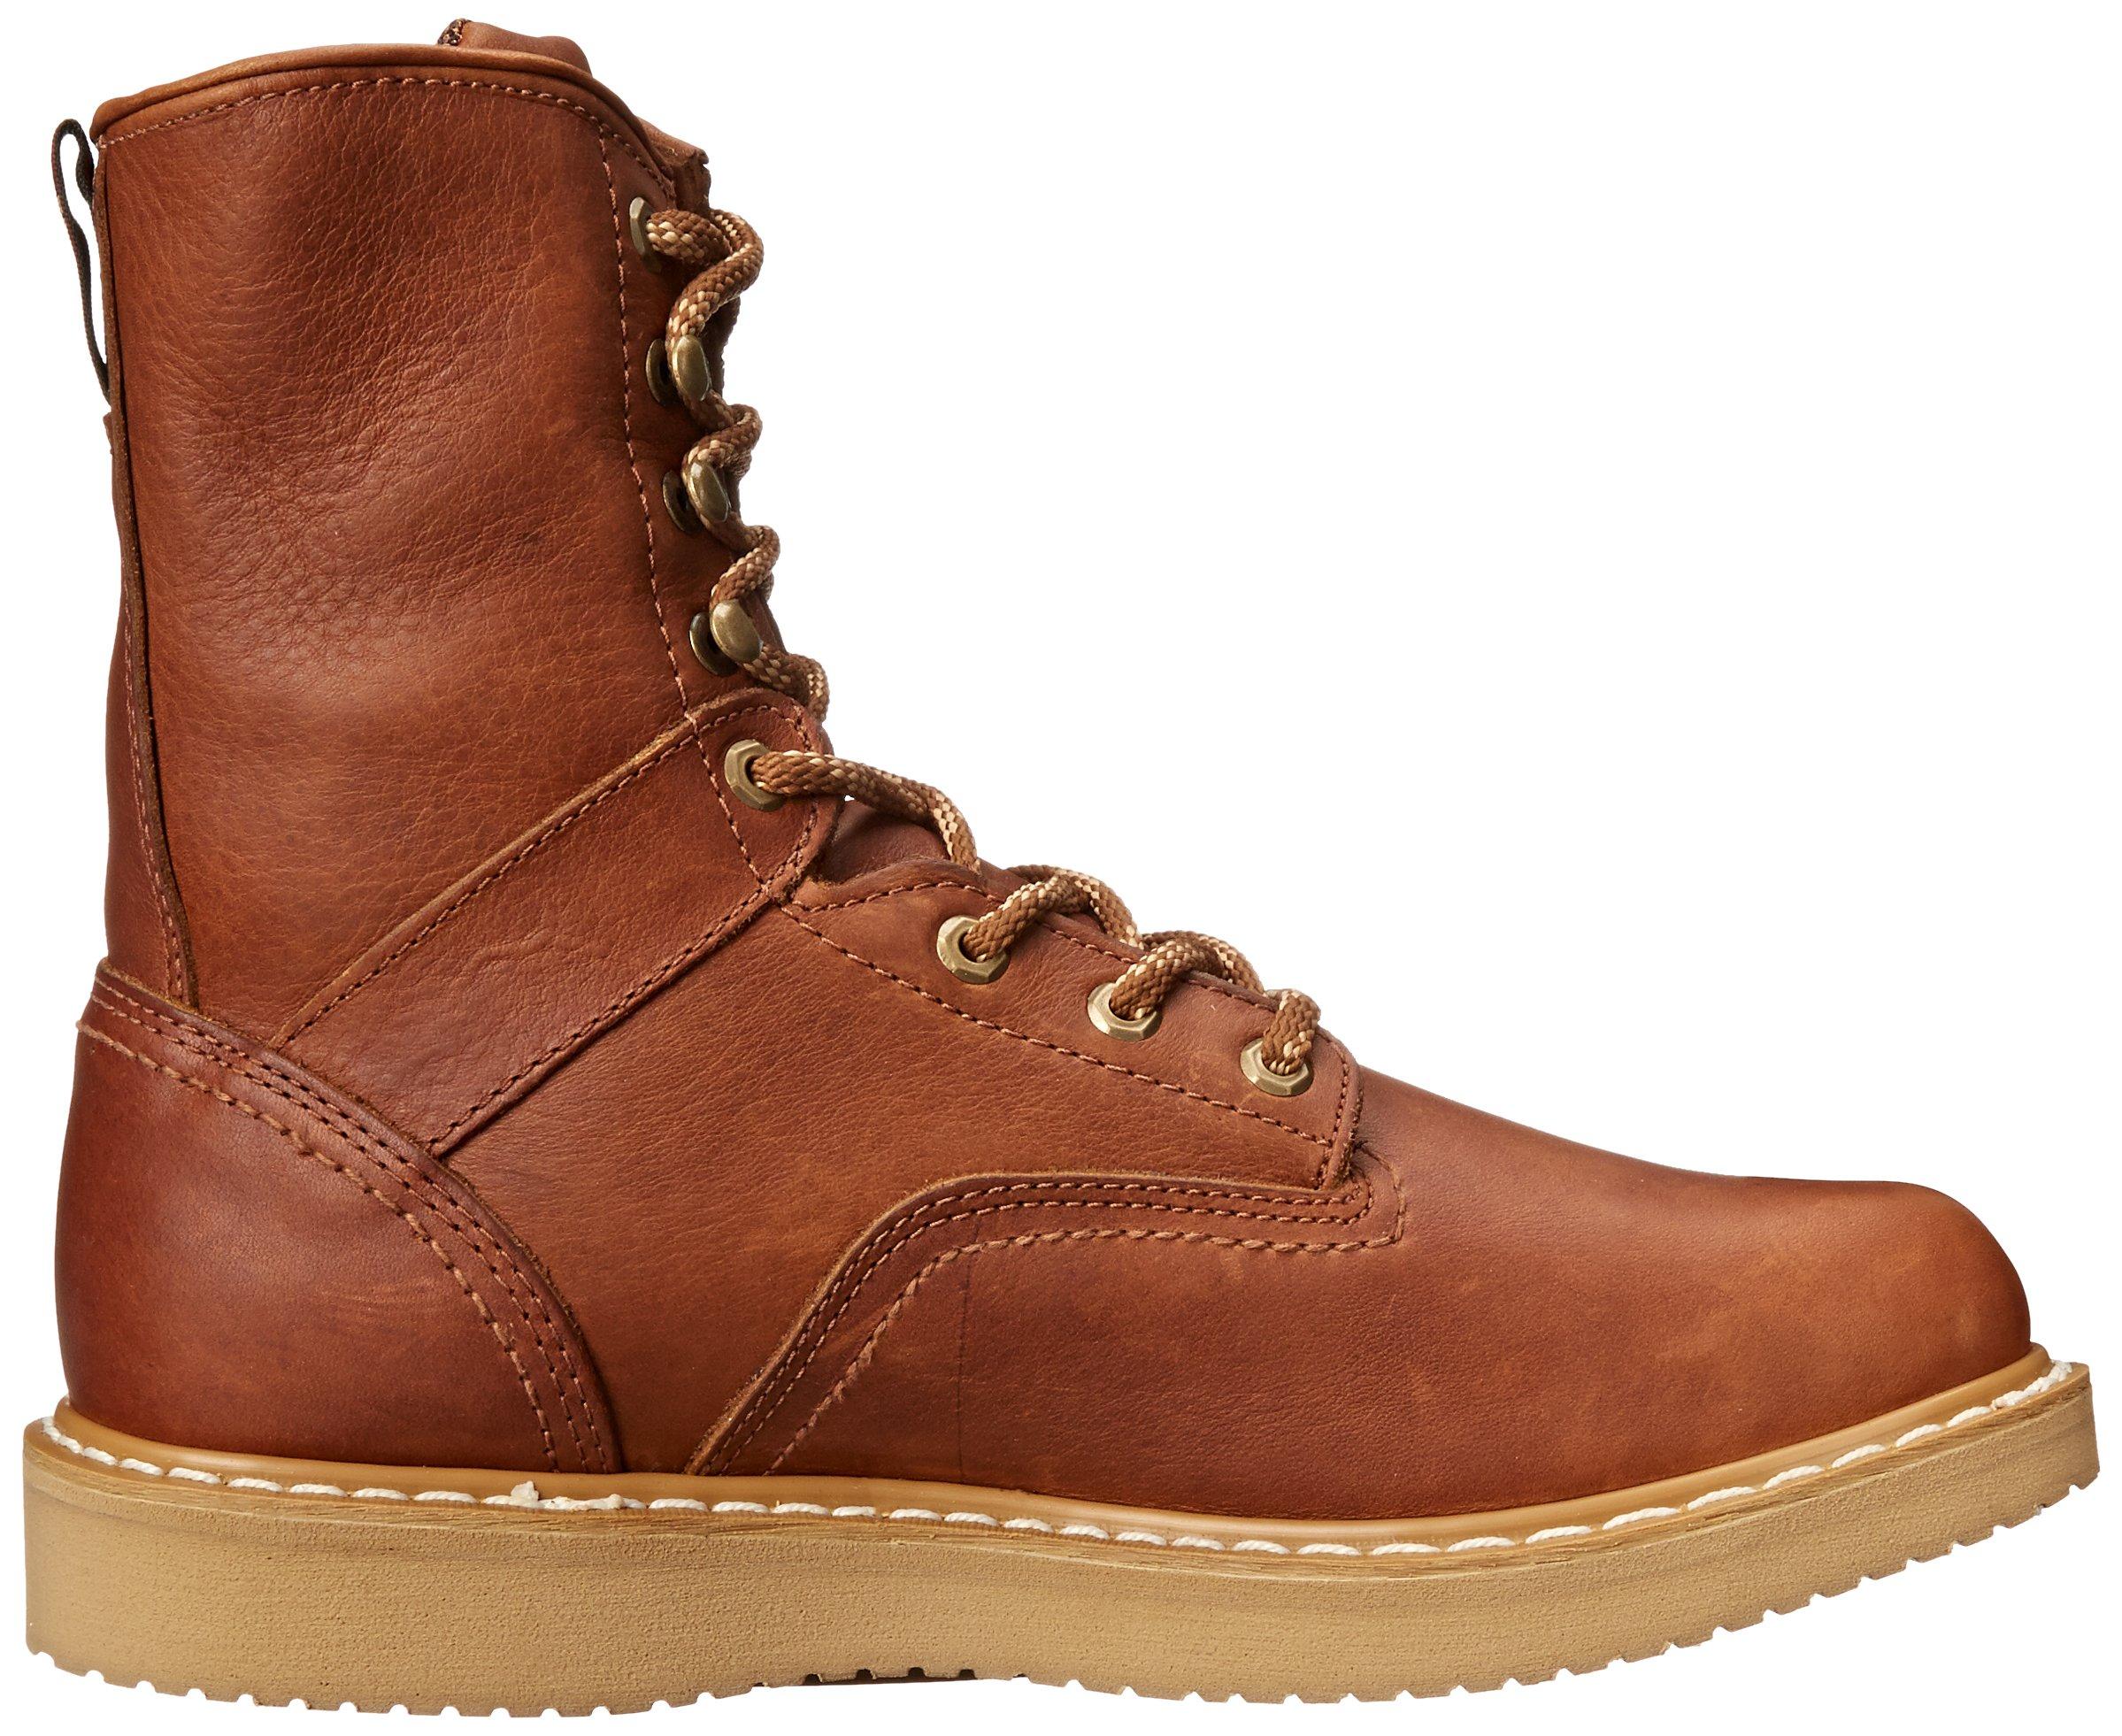 Georgia Boot Men's 8 Inch Wedge Work Shoe, Barracuda Gold, 12 W US by Georgia (Image #7)